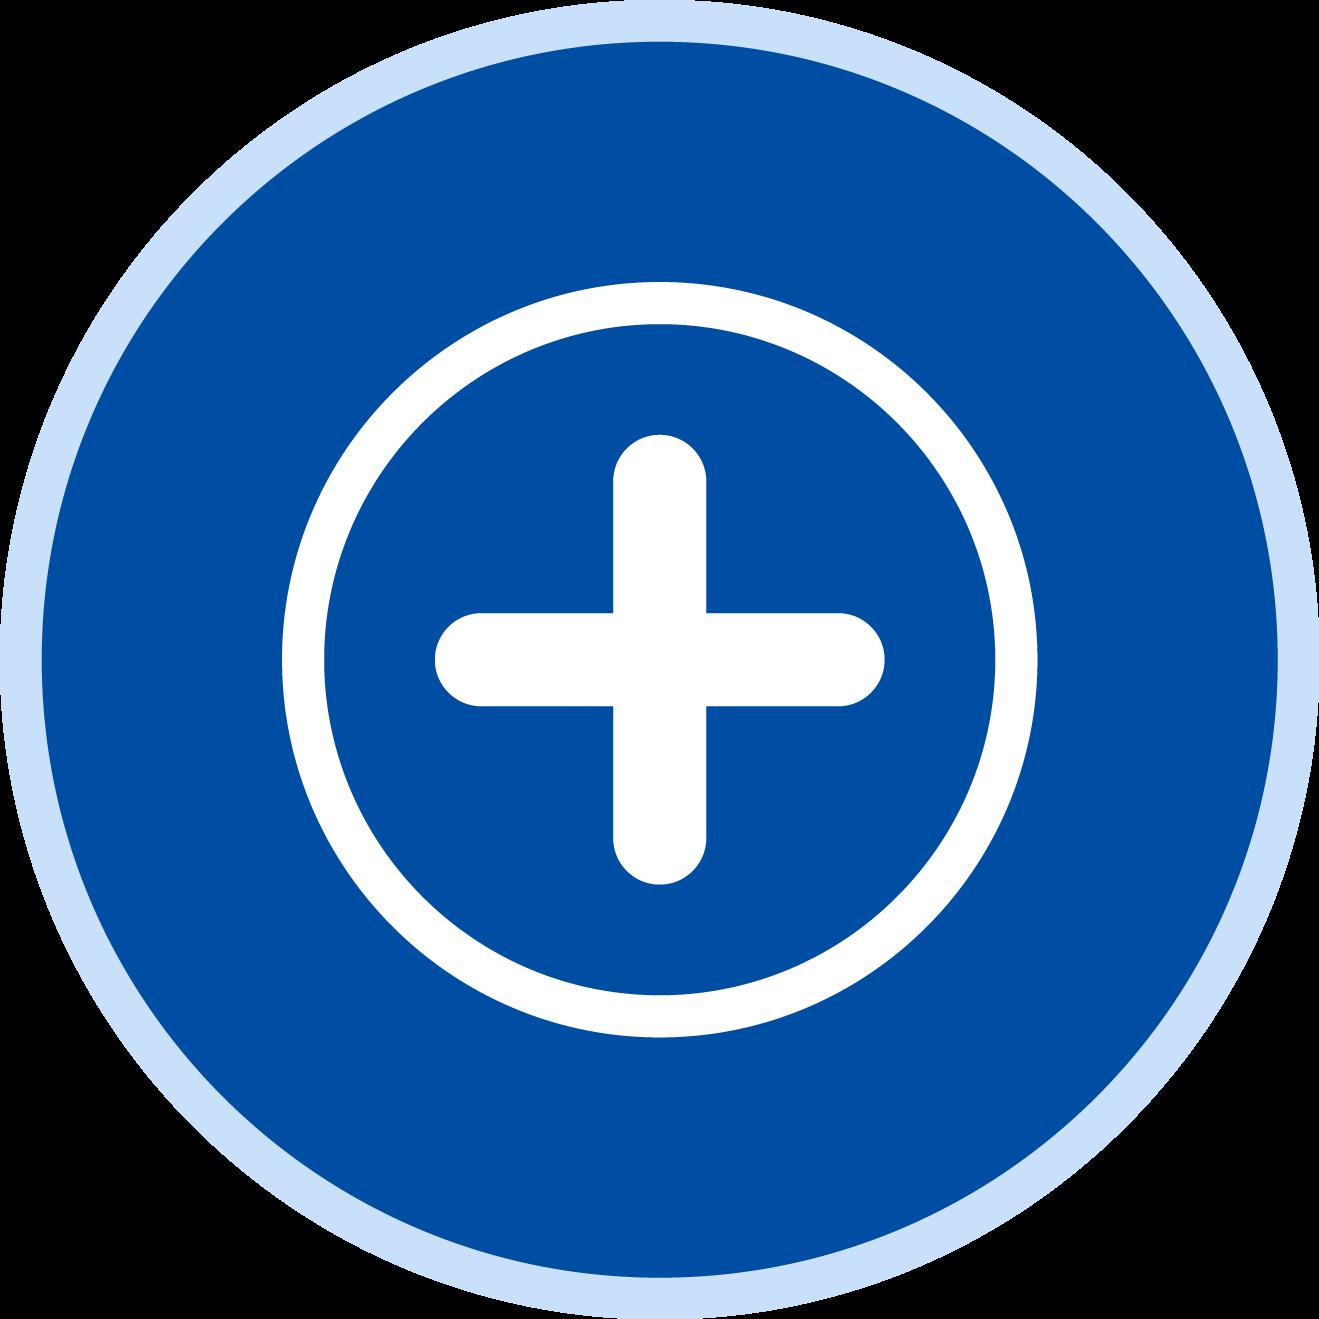 vishwaraj Hospital Emergency department, logo, sign, Icon png